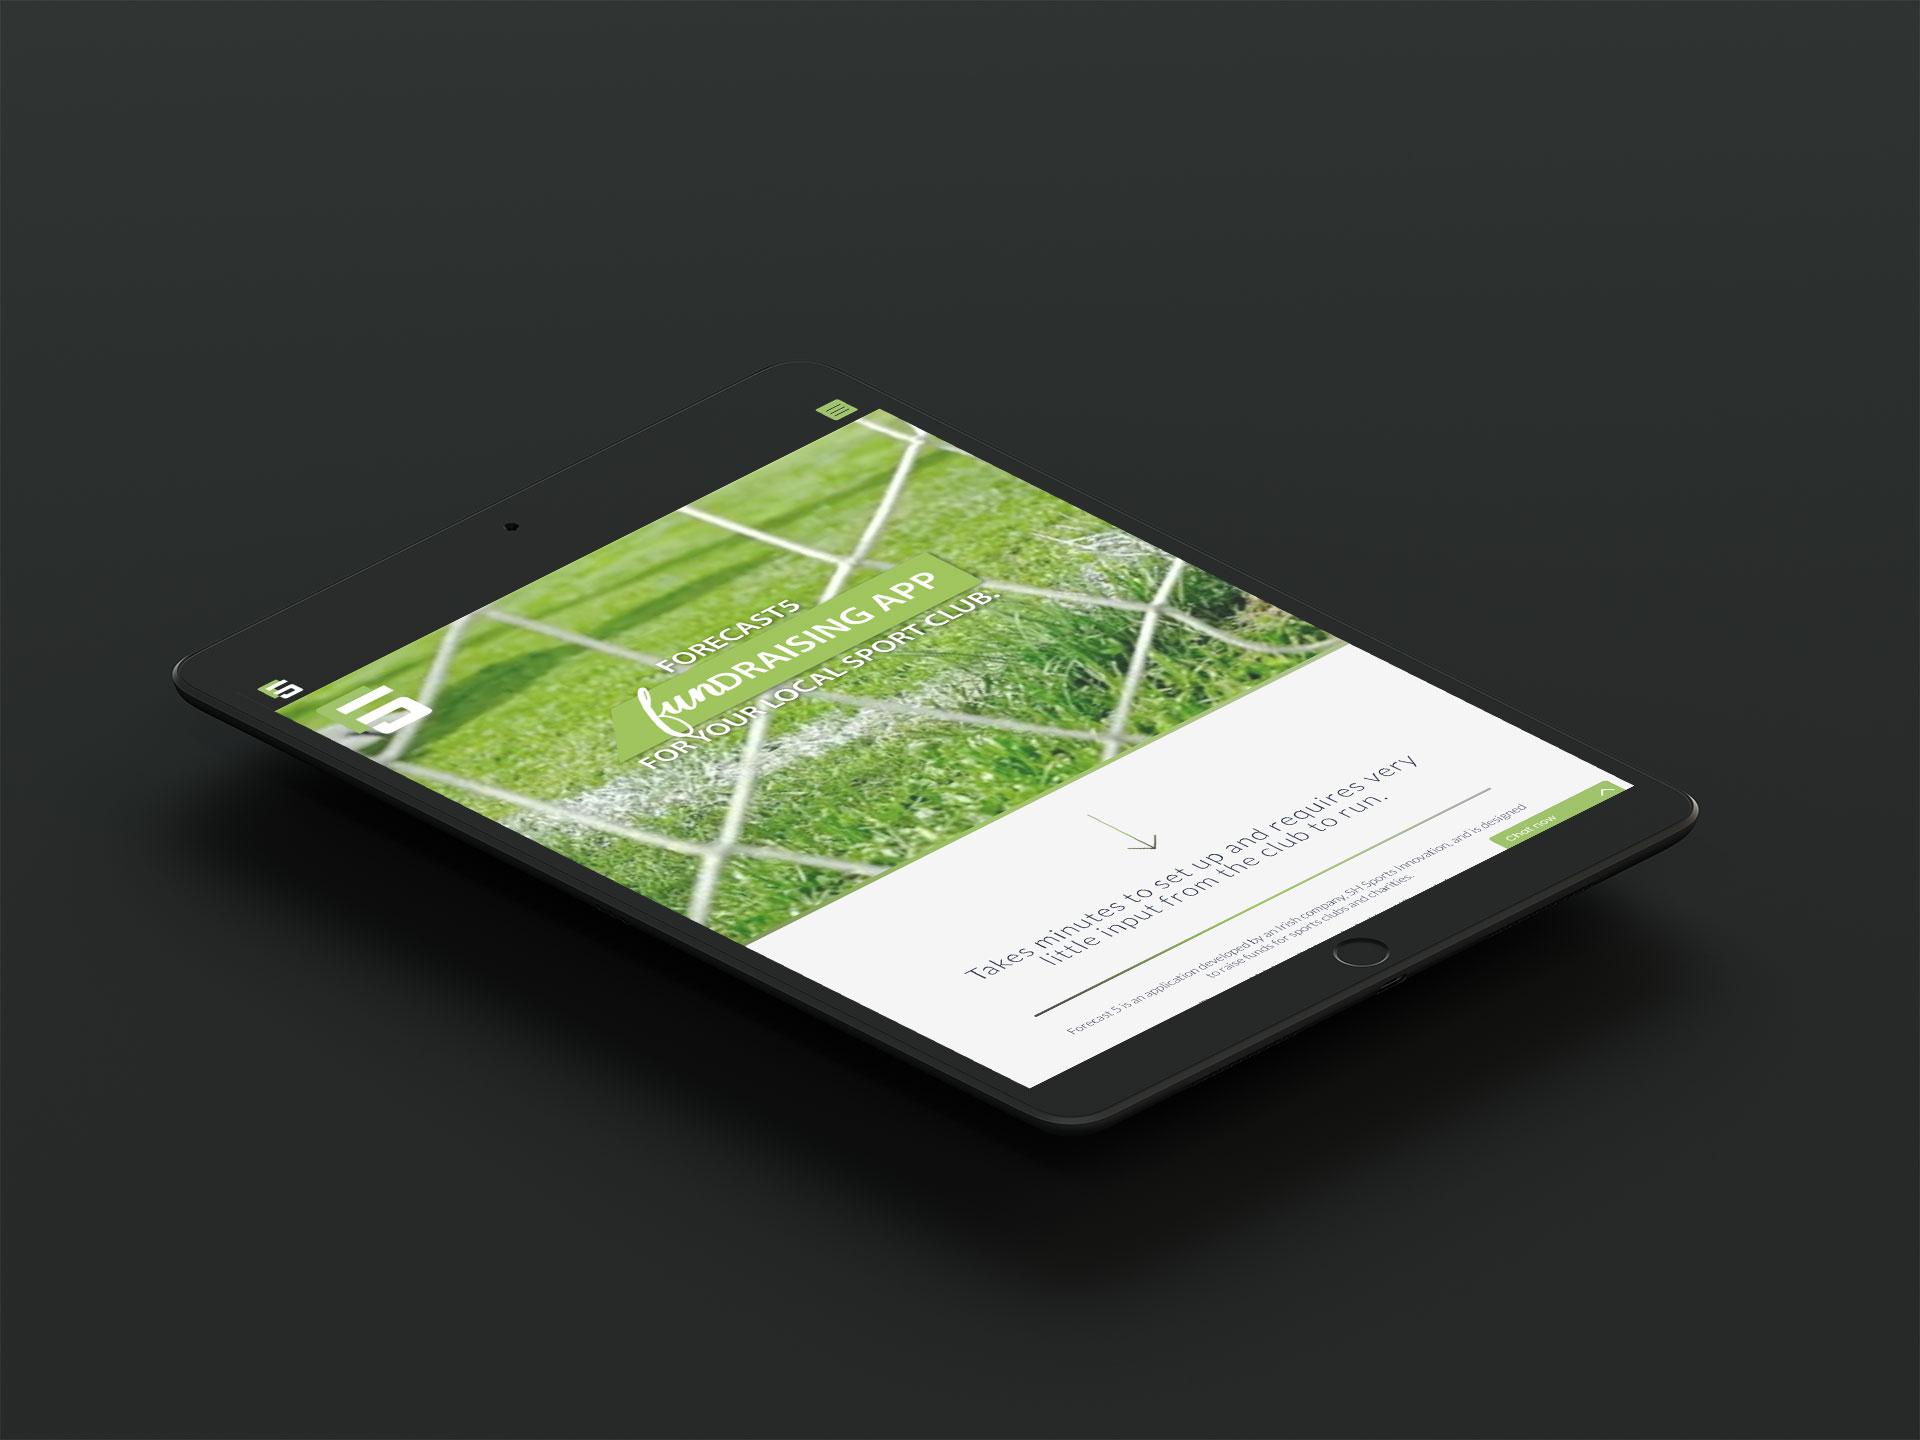 Forecast5 app website ipad